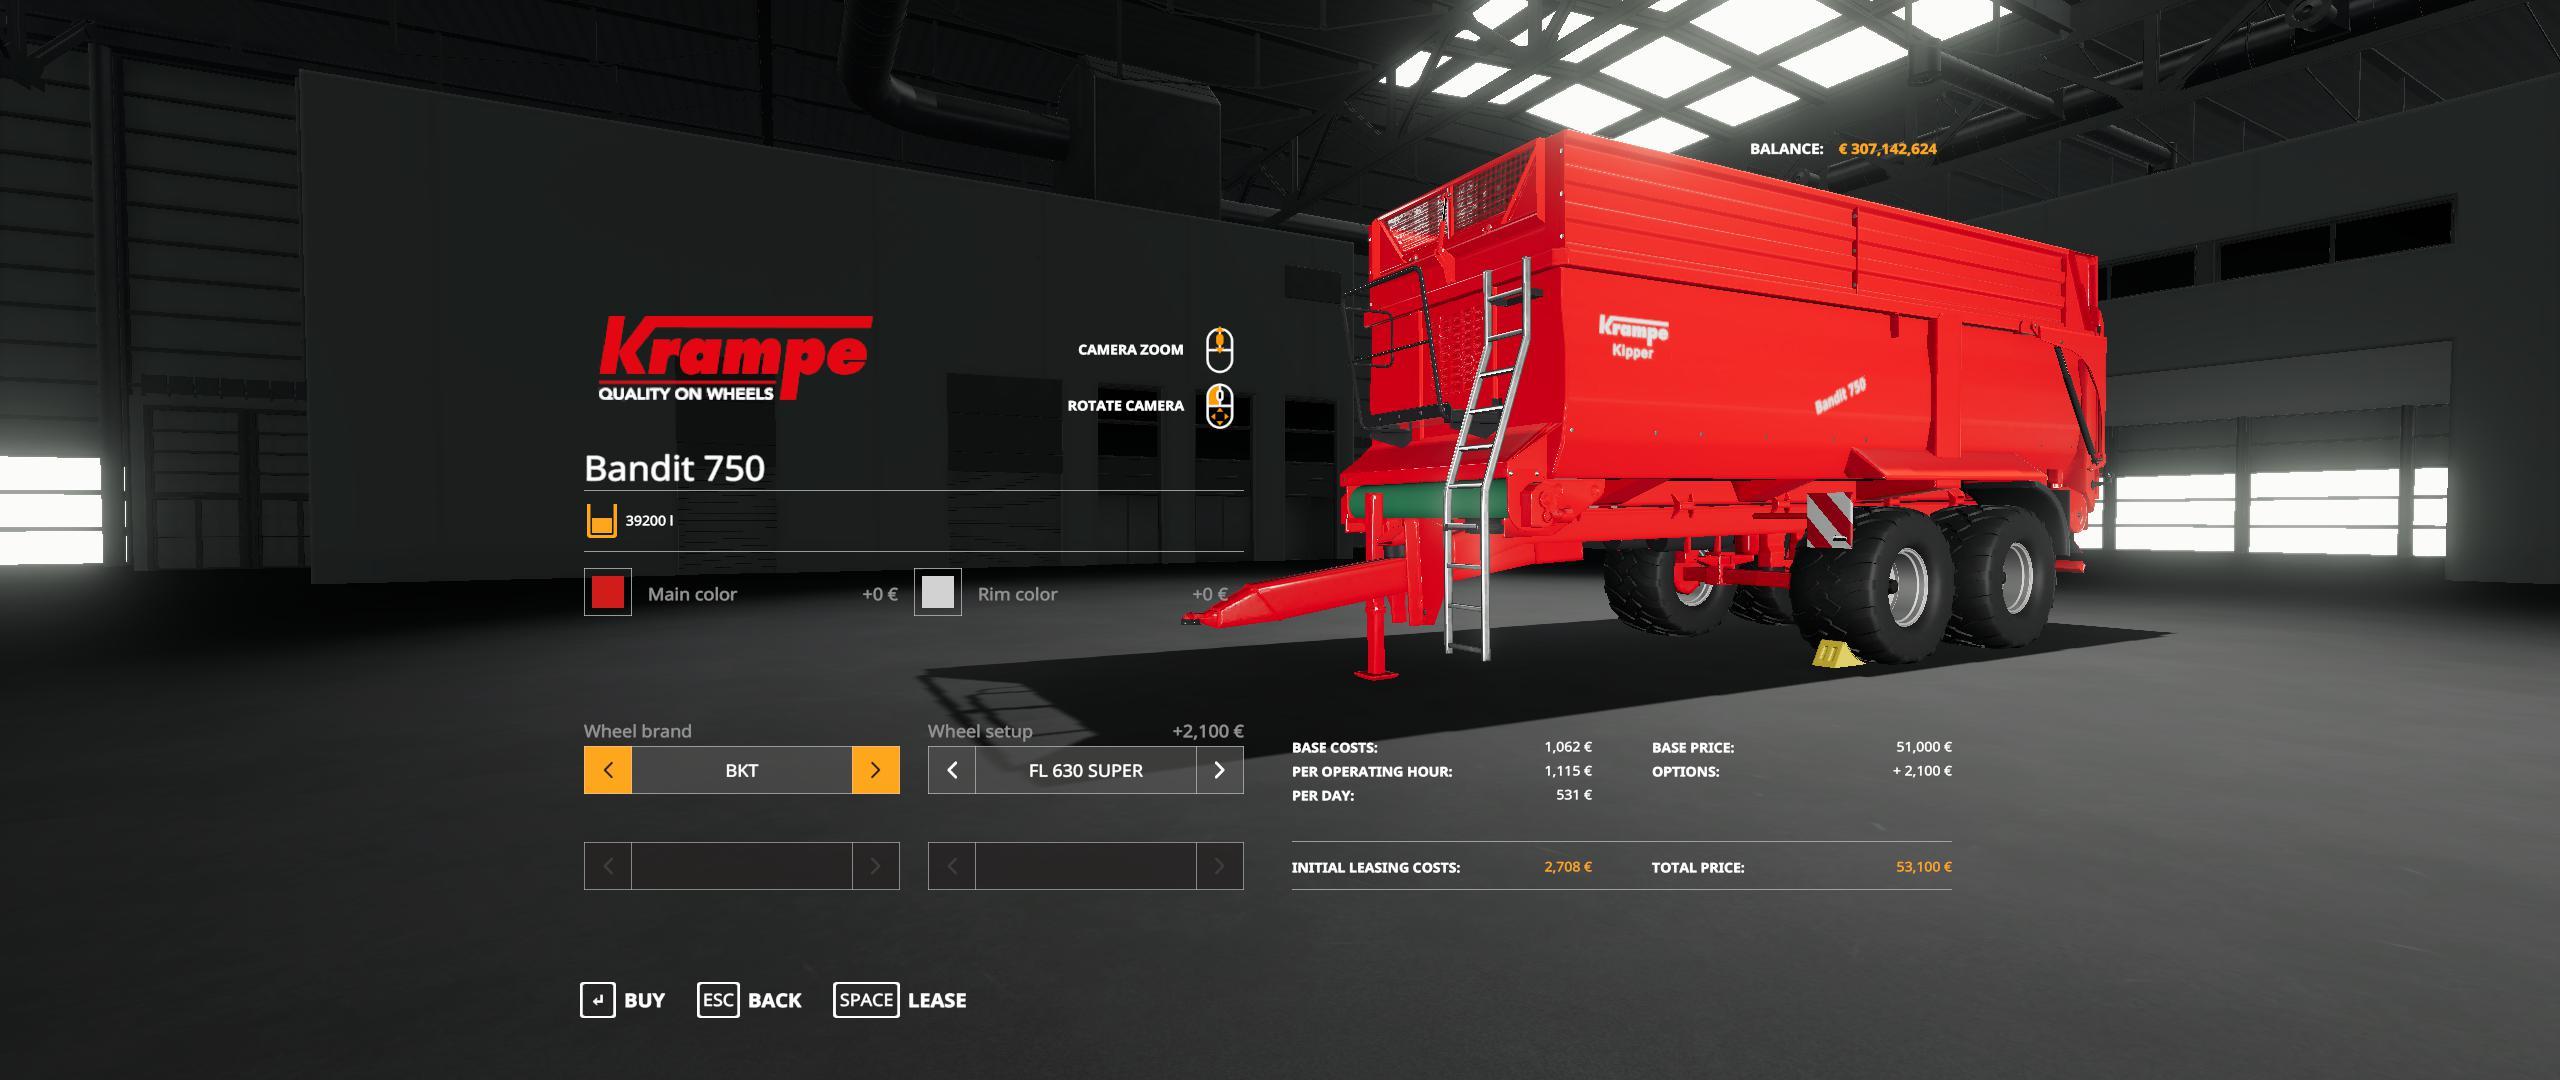 Krampe Bandit 750 By Gamling v 1.0